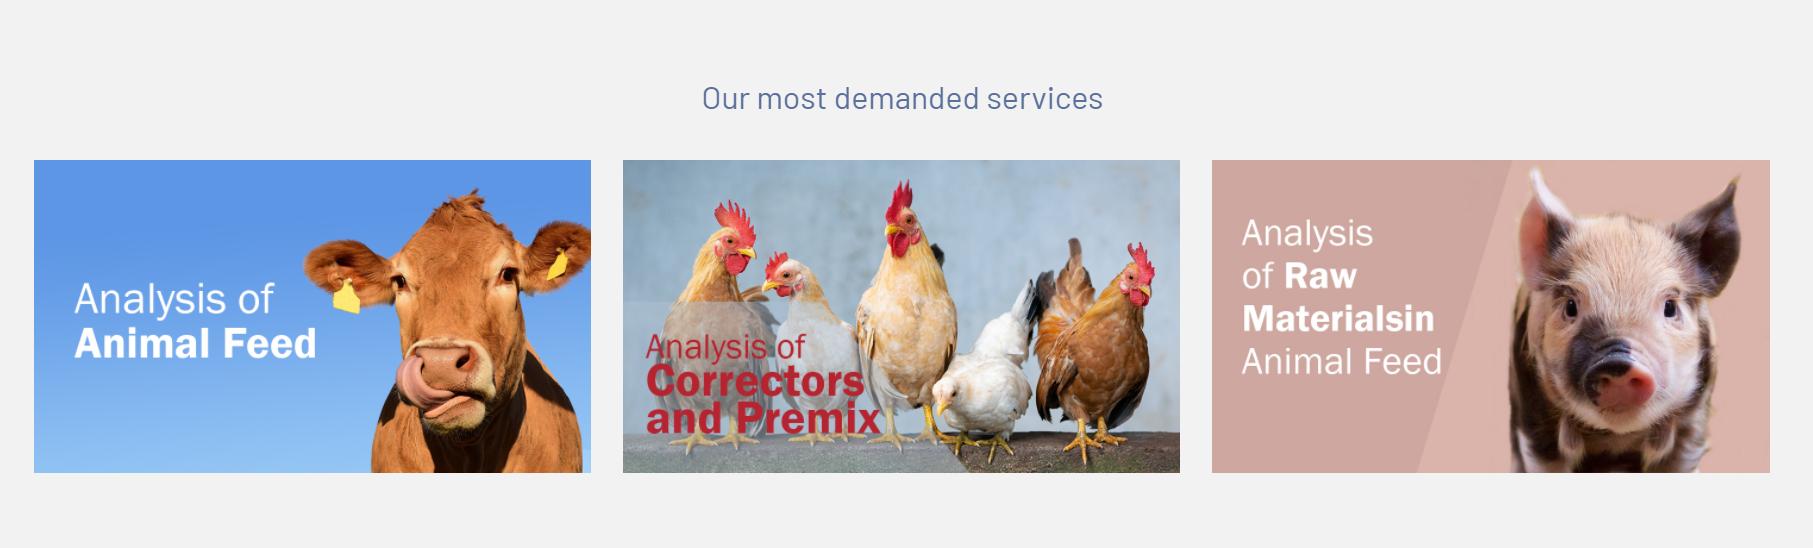 Labocor Analítica presents its new corporative website